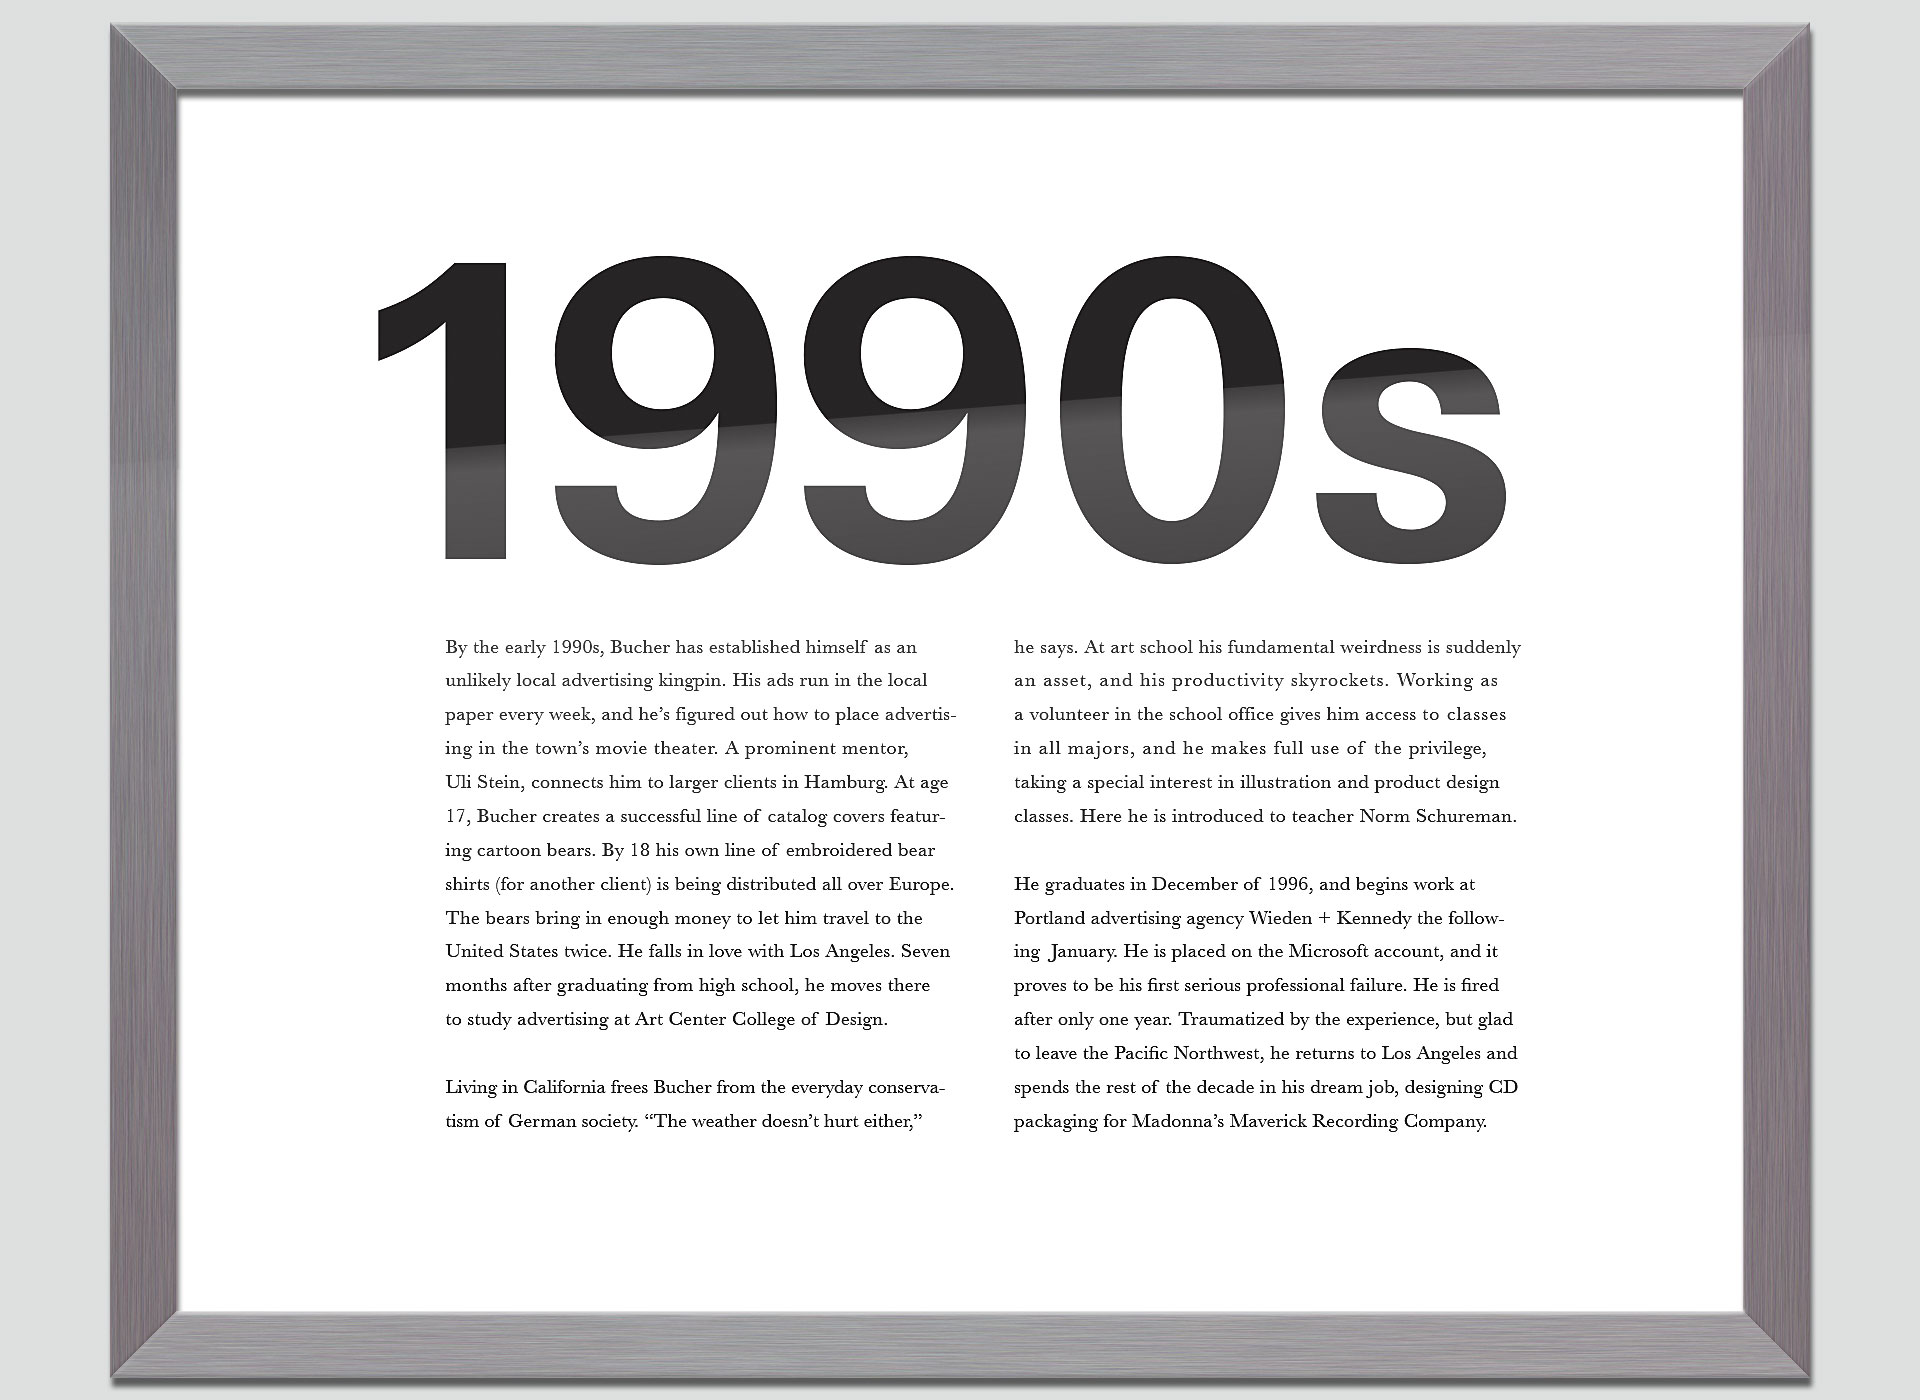 everything-decades-1990@2x.jpg